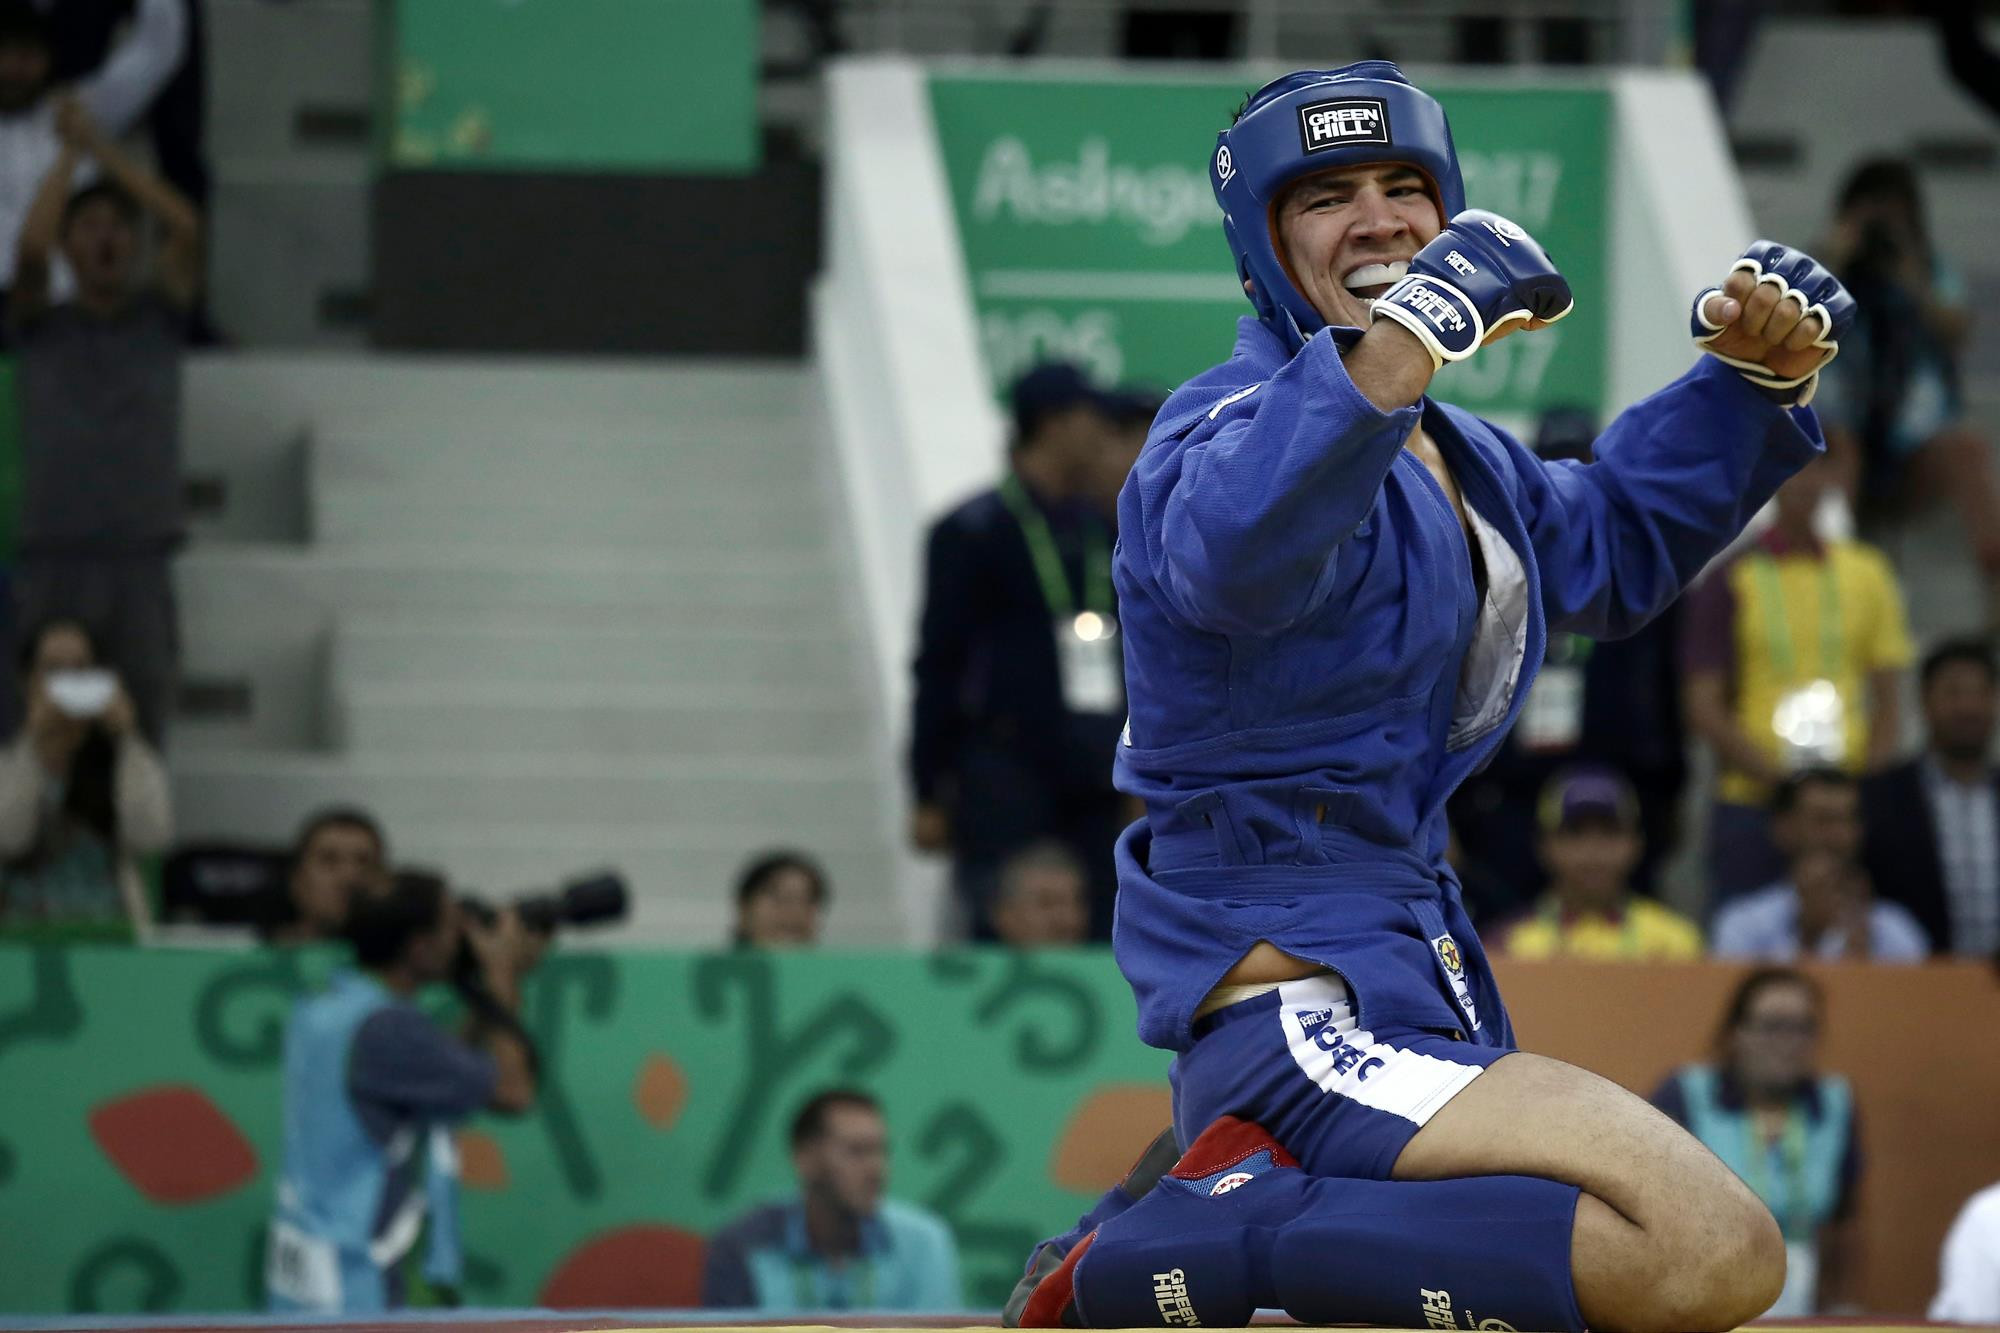 Turkmenistan's Çarymyrat Annagurbanow won the men's combat under 100 kilograms sambo competition ©Ashgabat 2017/Facebook